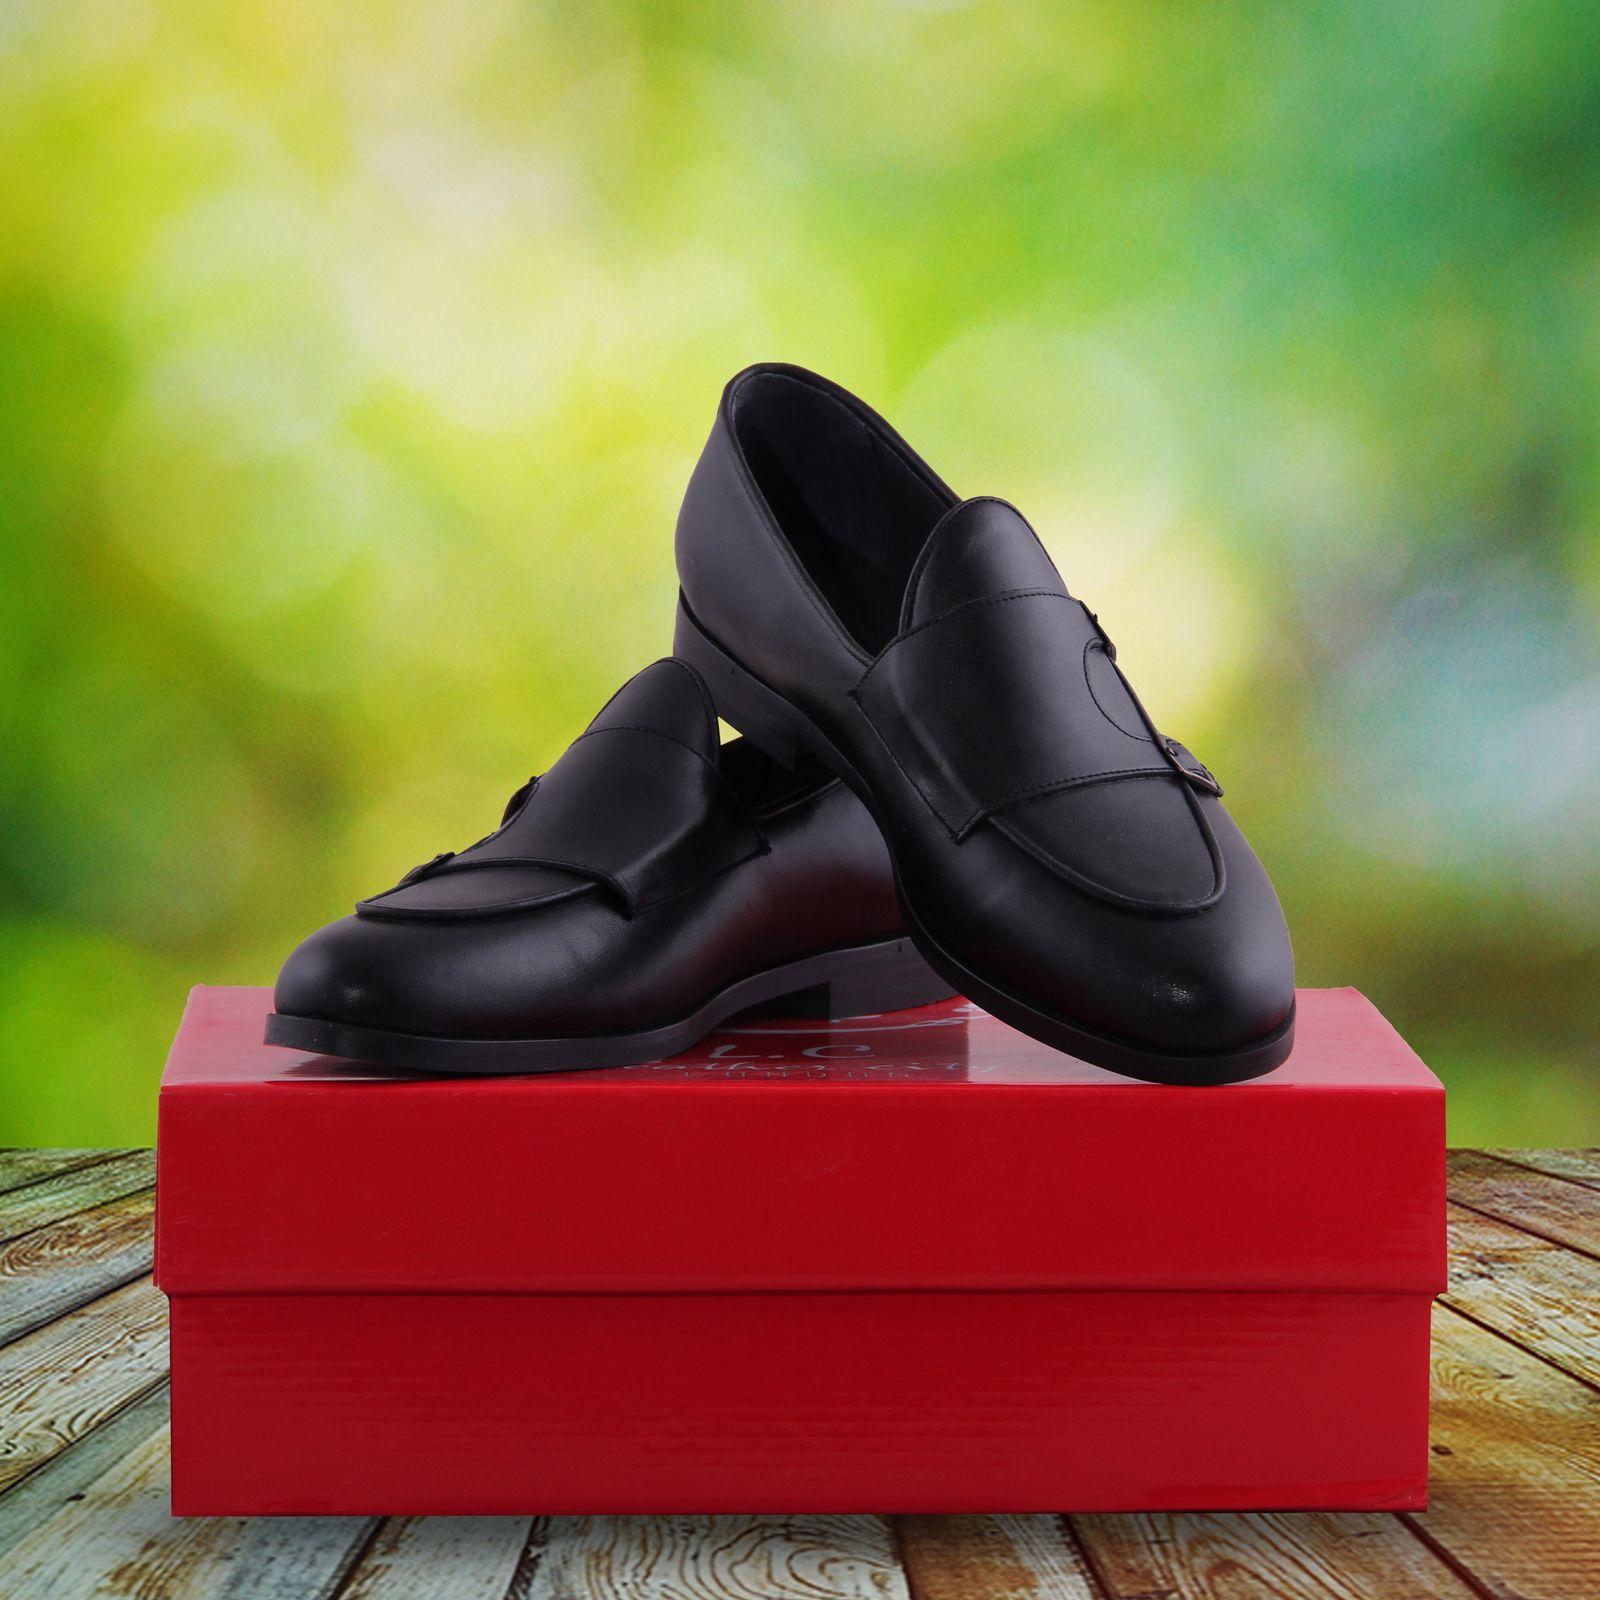 کفش مردانه شهر چرم مدل S961-1 -  - 7